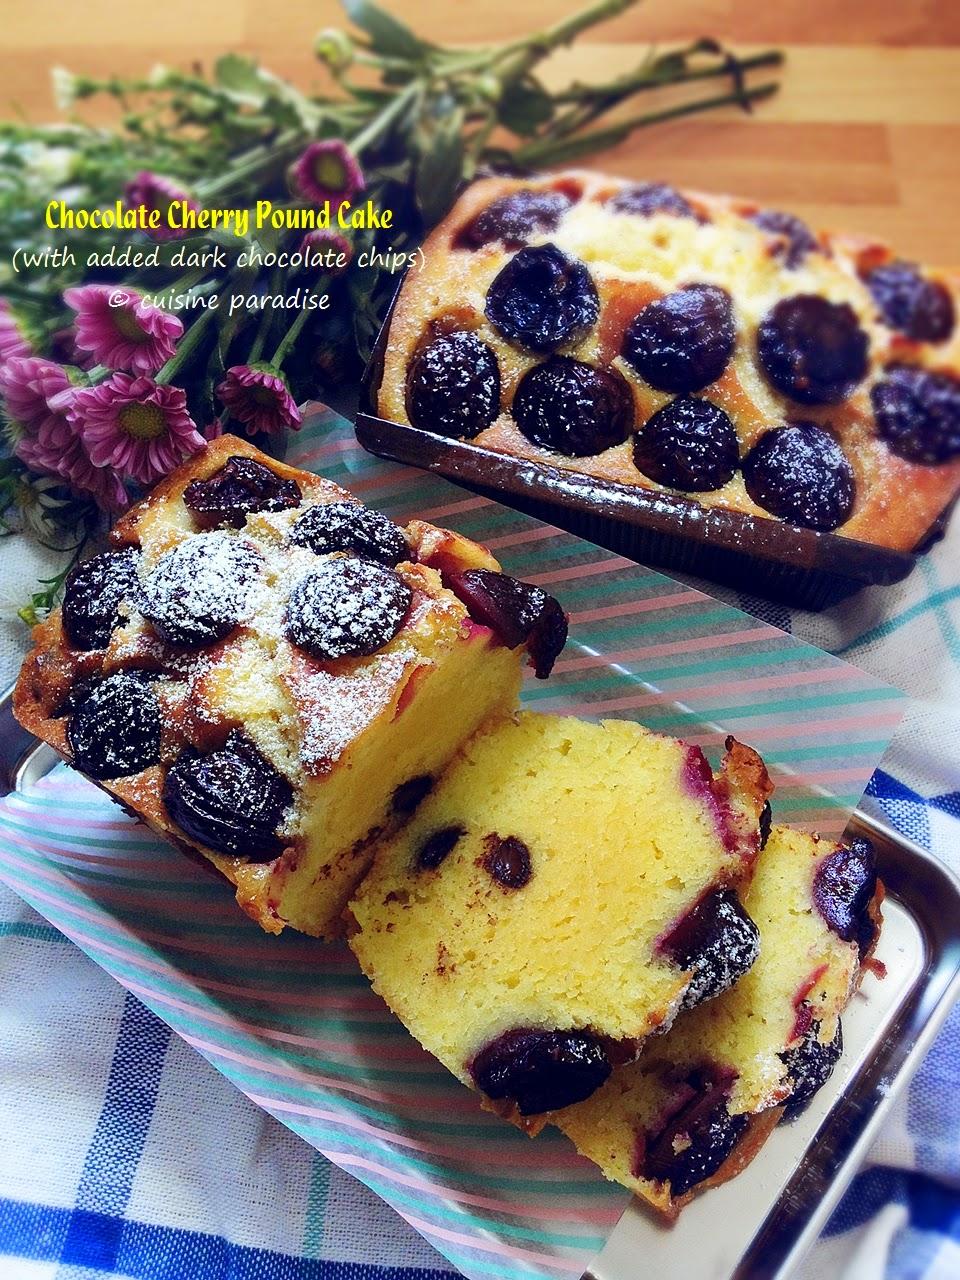 tea chocolate cherry pound cake frankly speaking this pound cake ...